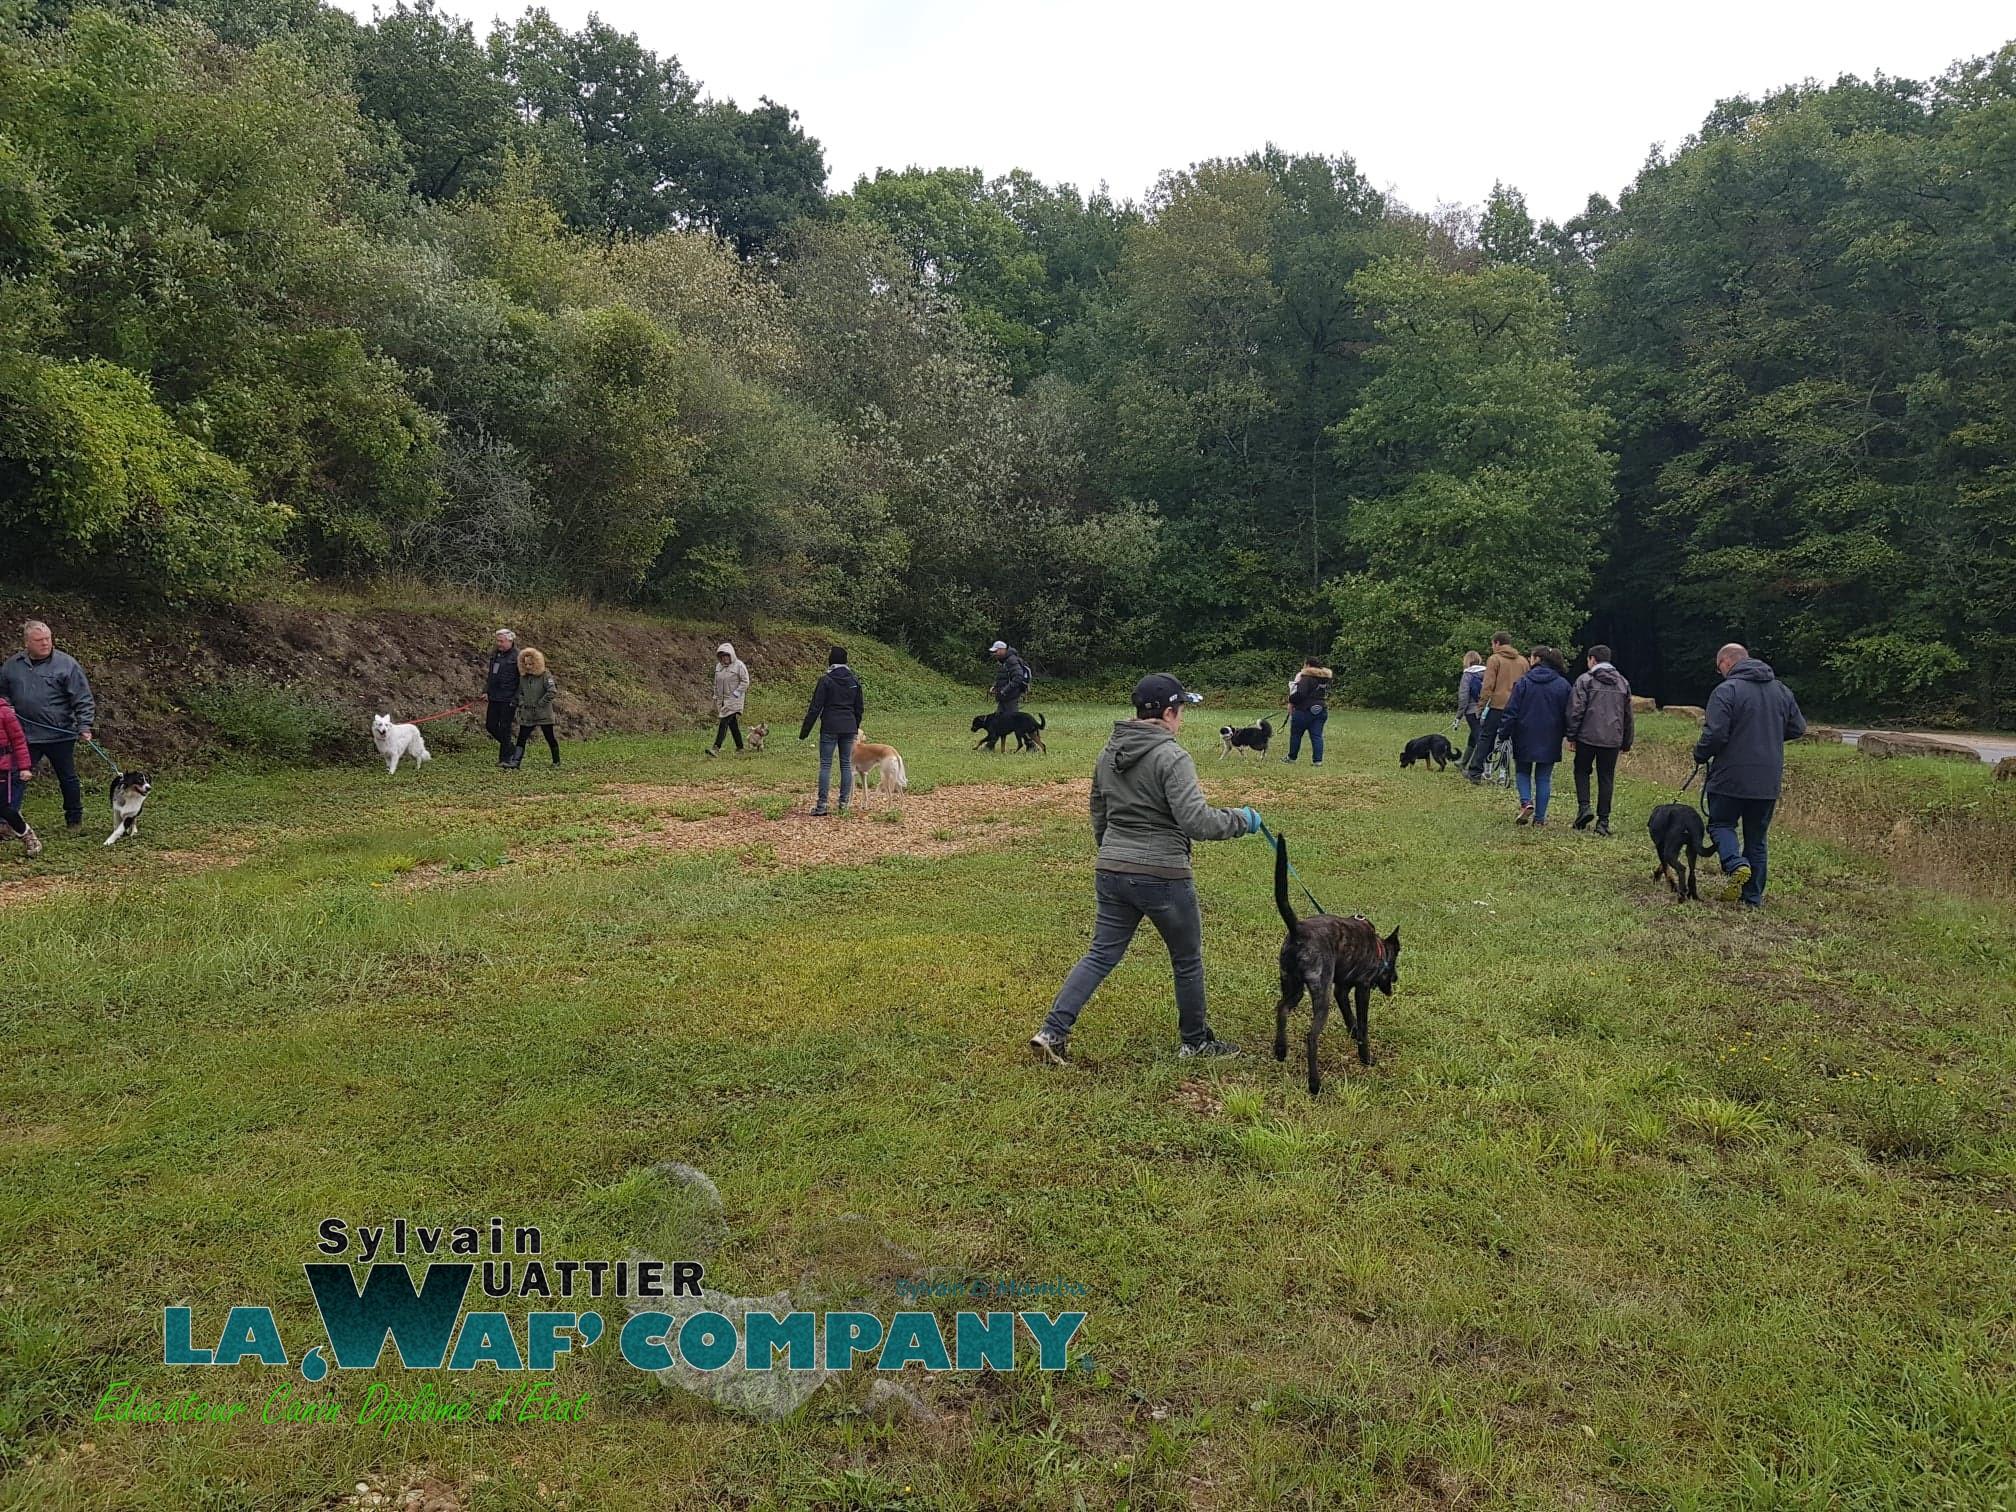 Promenade éducative collective | LA WAF COMPANY ® - Sylvain WUATTIER, éducateur canin